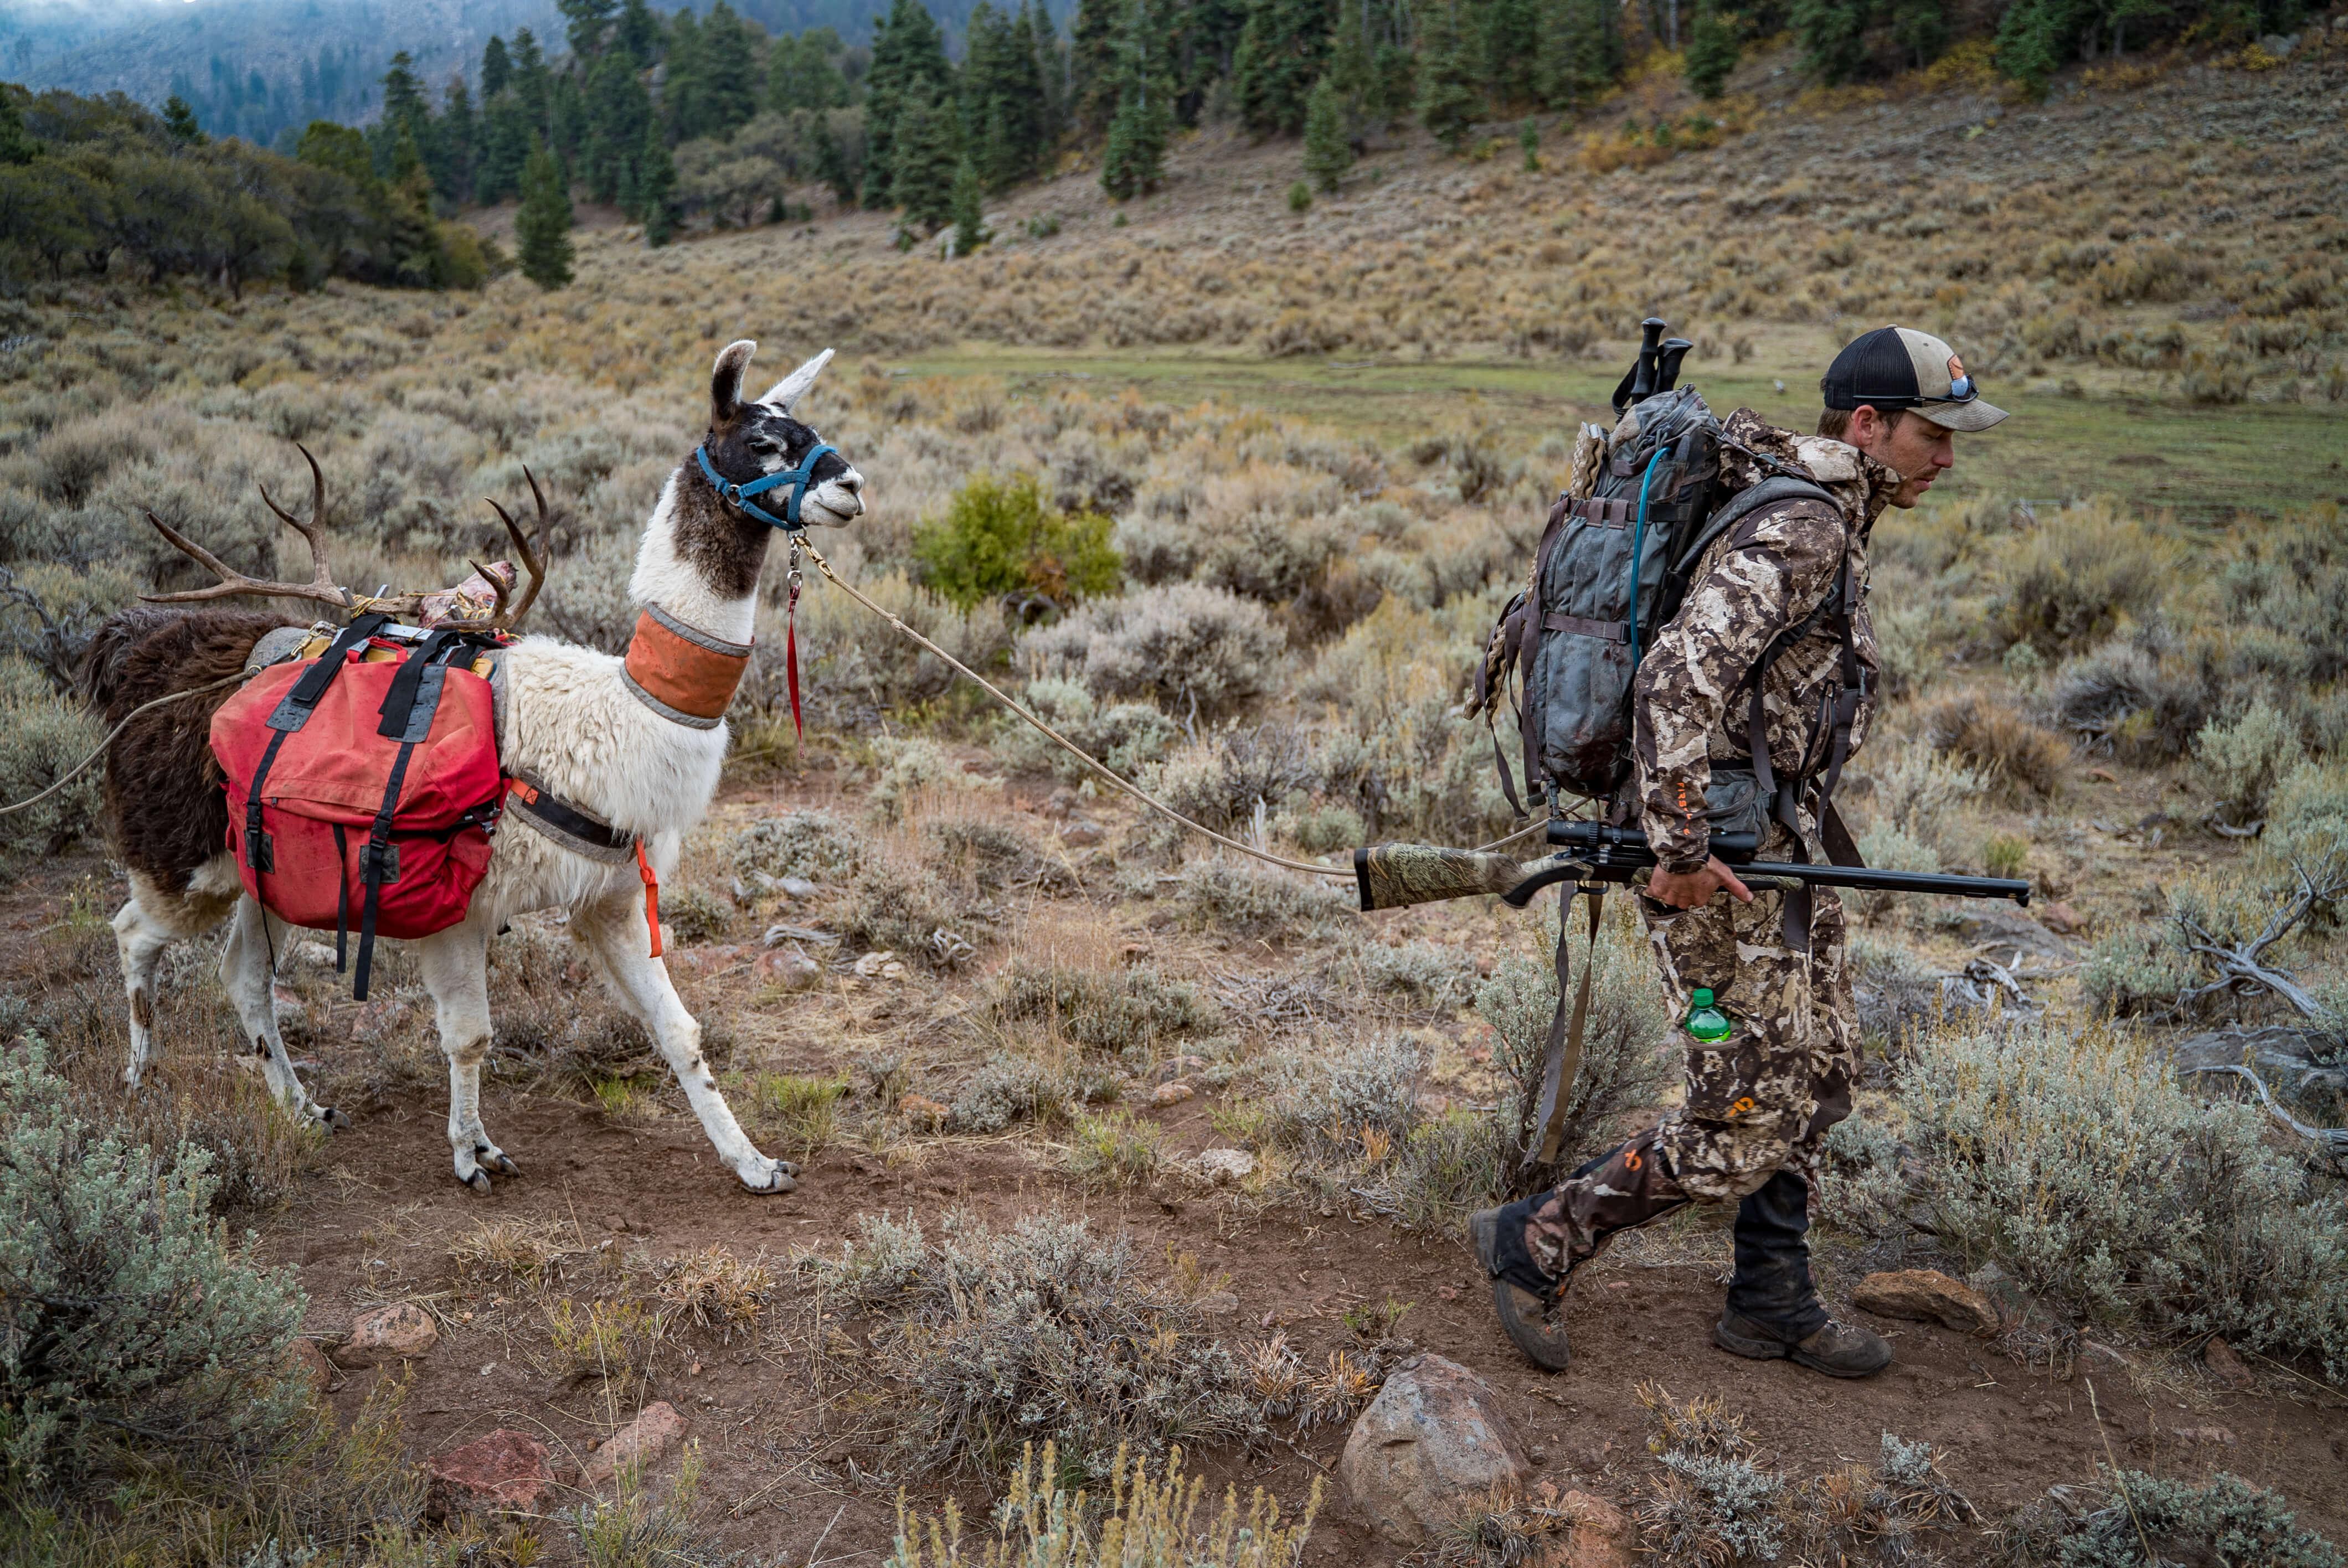 backcountry mule deer hunting muzzleloader pack llamas